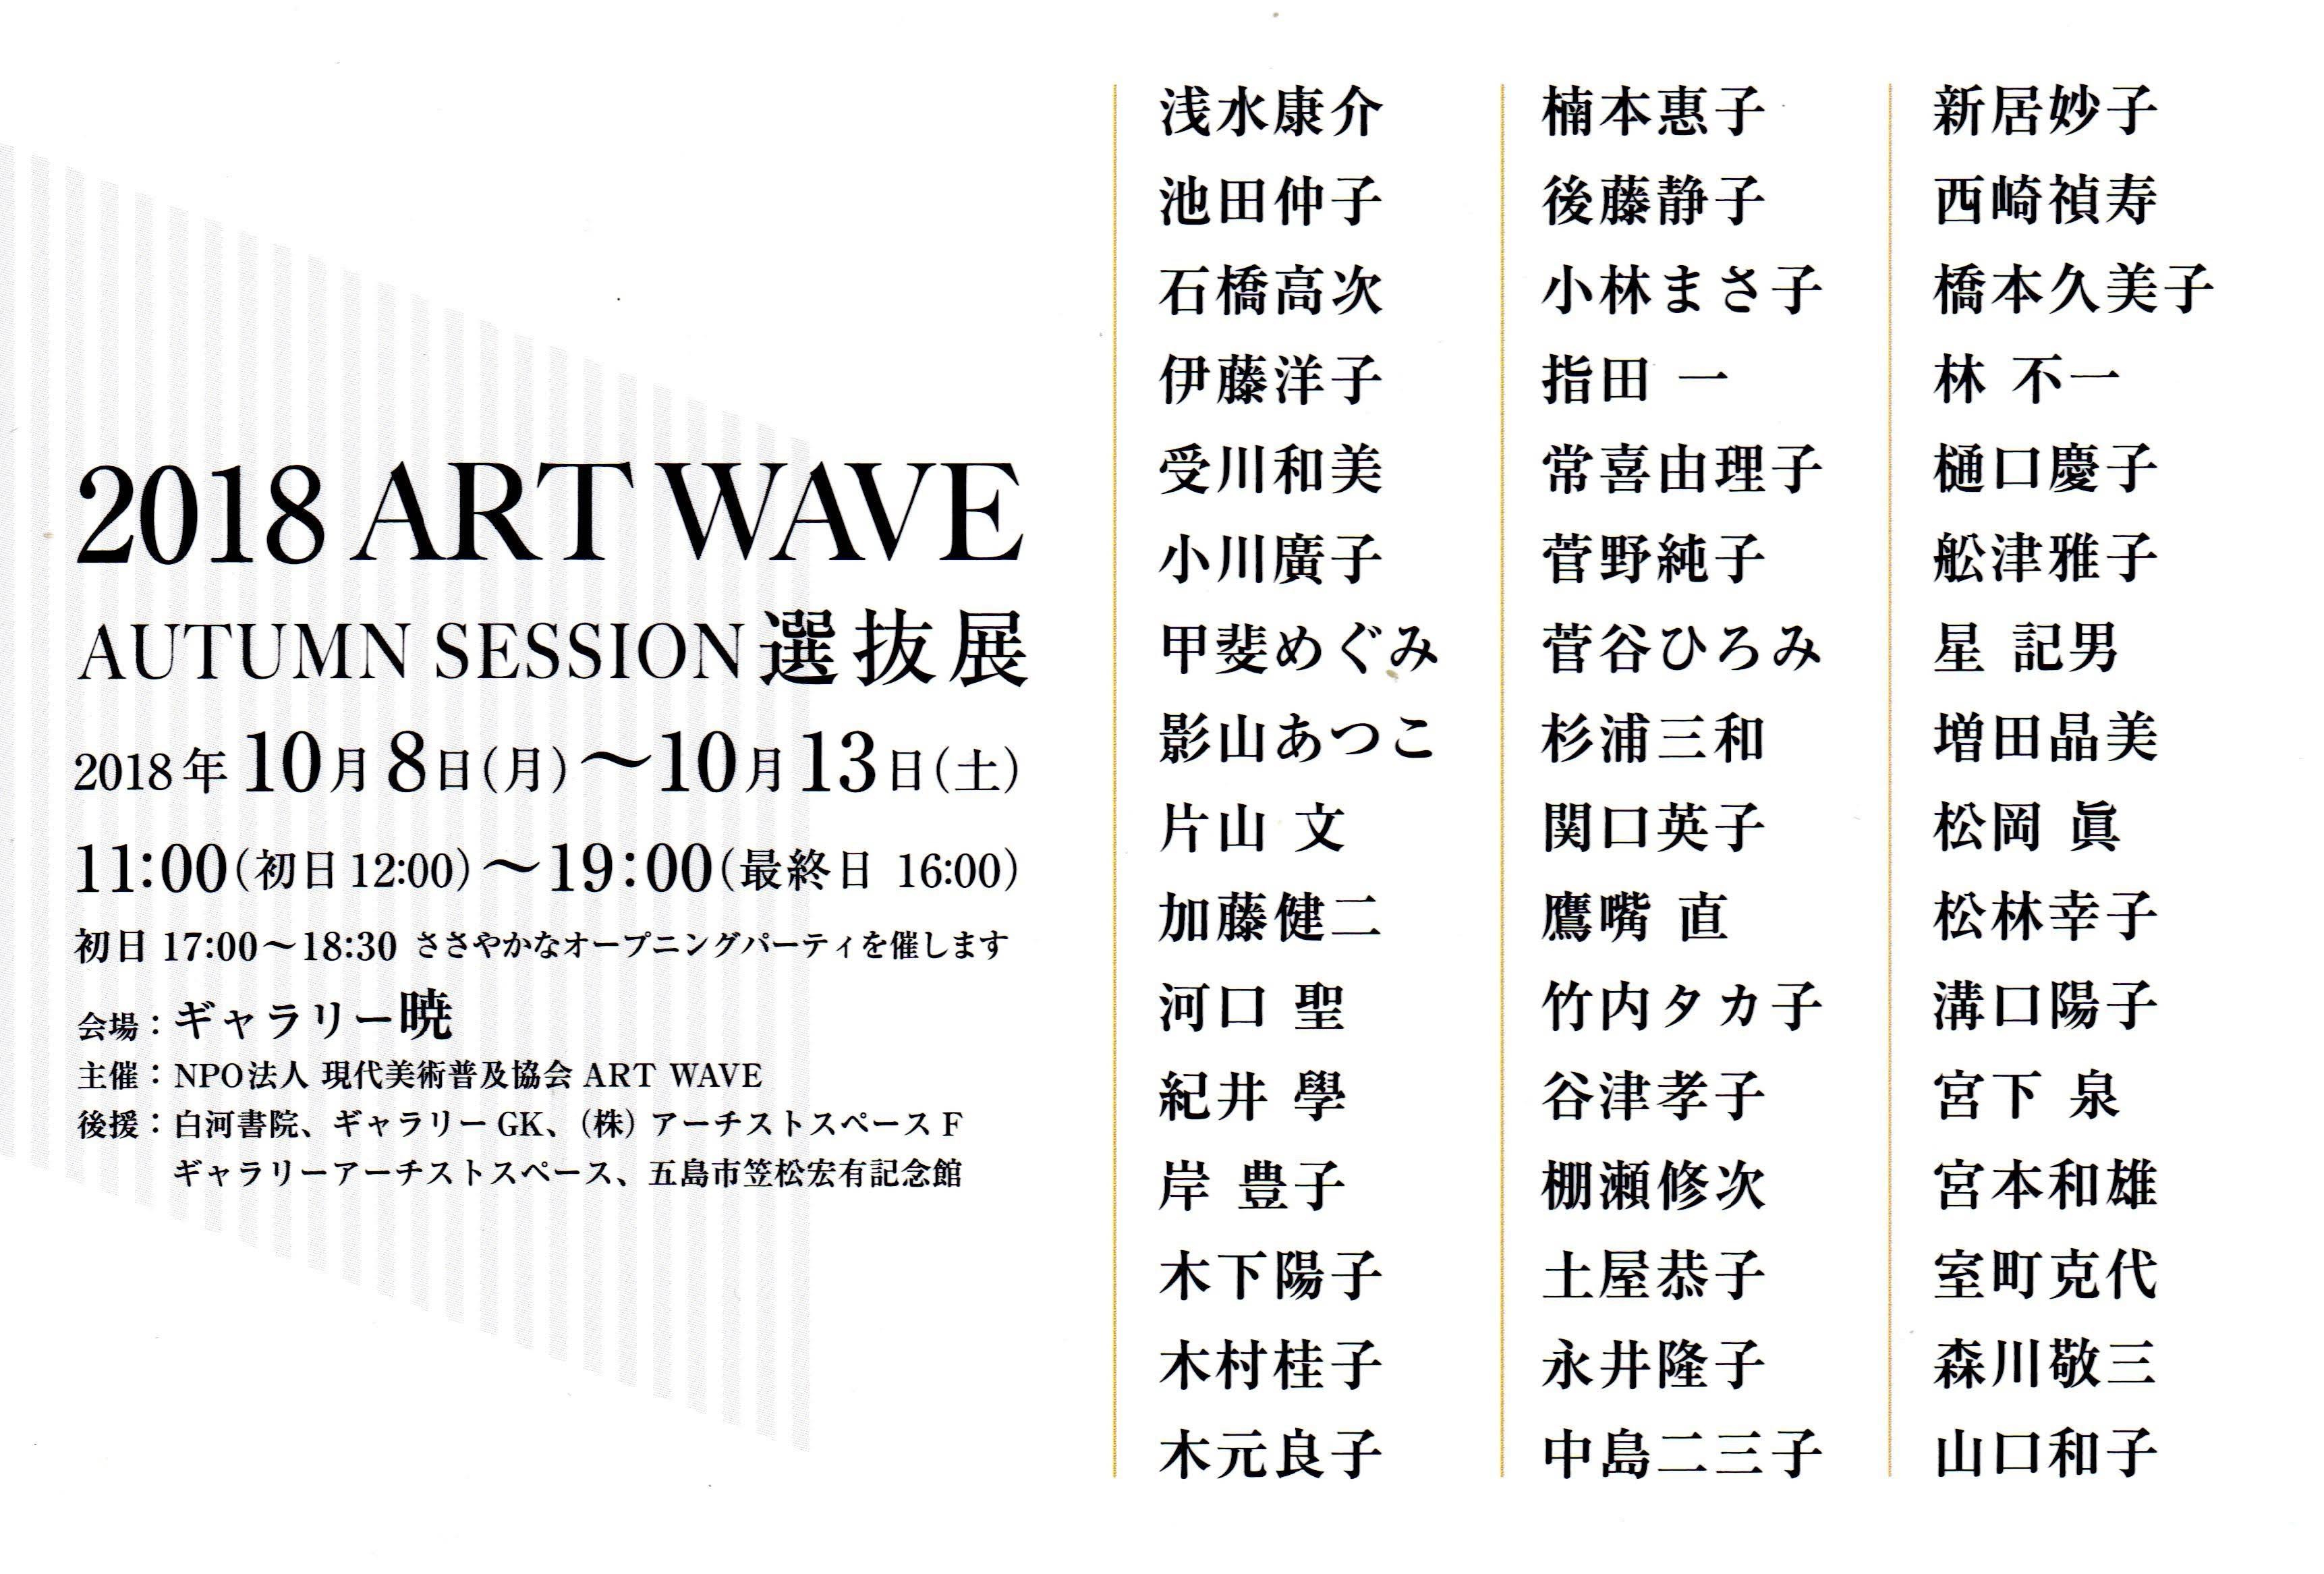 2018 ART WAVE [AUTUMN SESSION 選抜展]。伊藤洋子も参加。